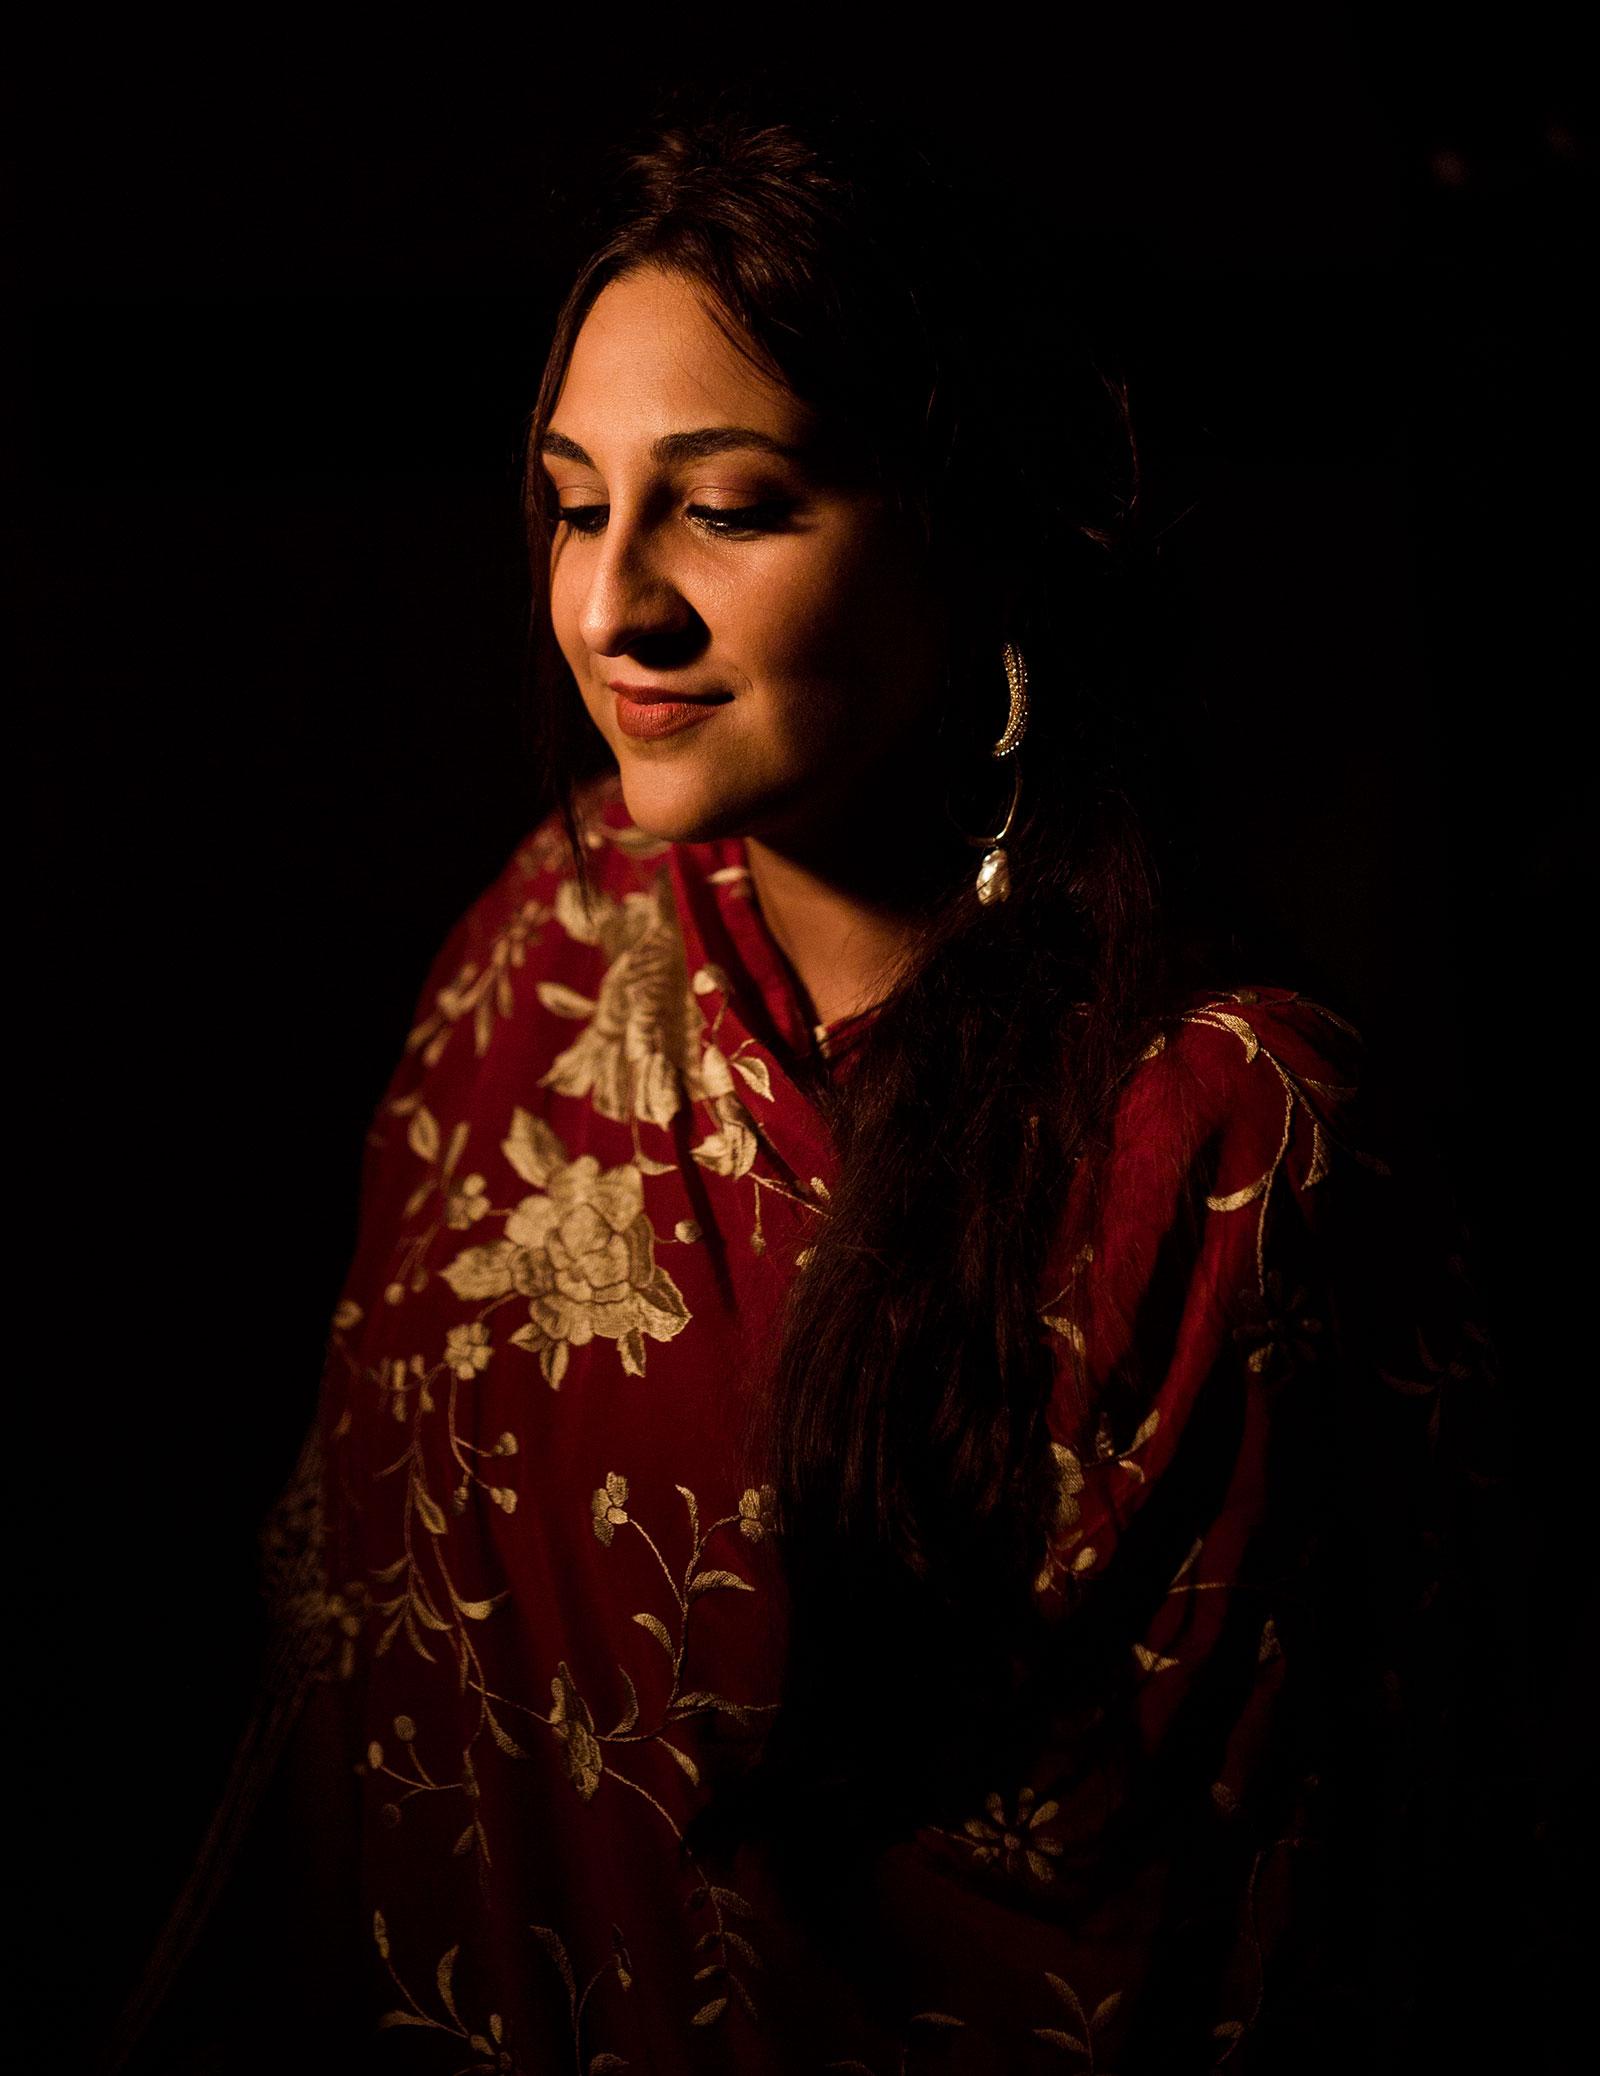 Lela Soto - foto: Rufo - Festival Flamenco Toulouse